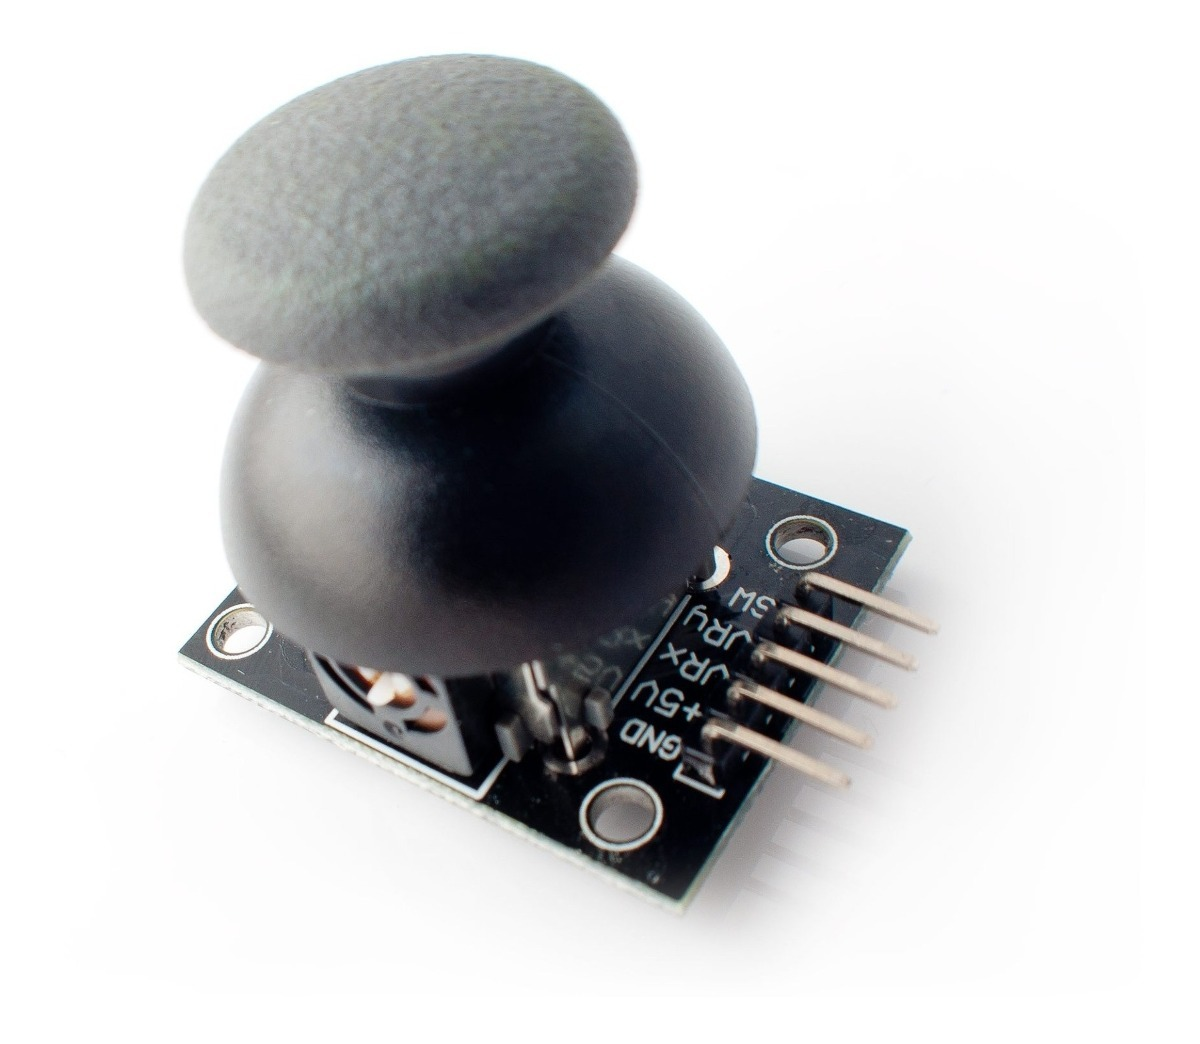 Módulo Joystick Para Arduino Arduino Pic Electrogeek